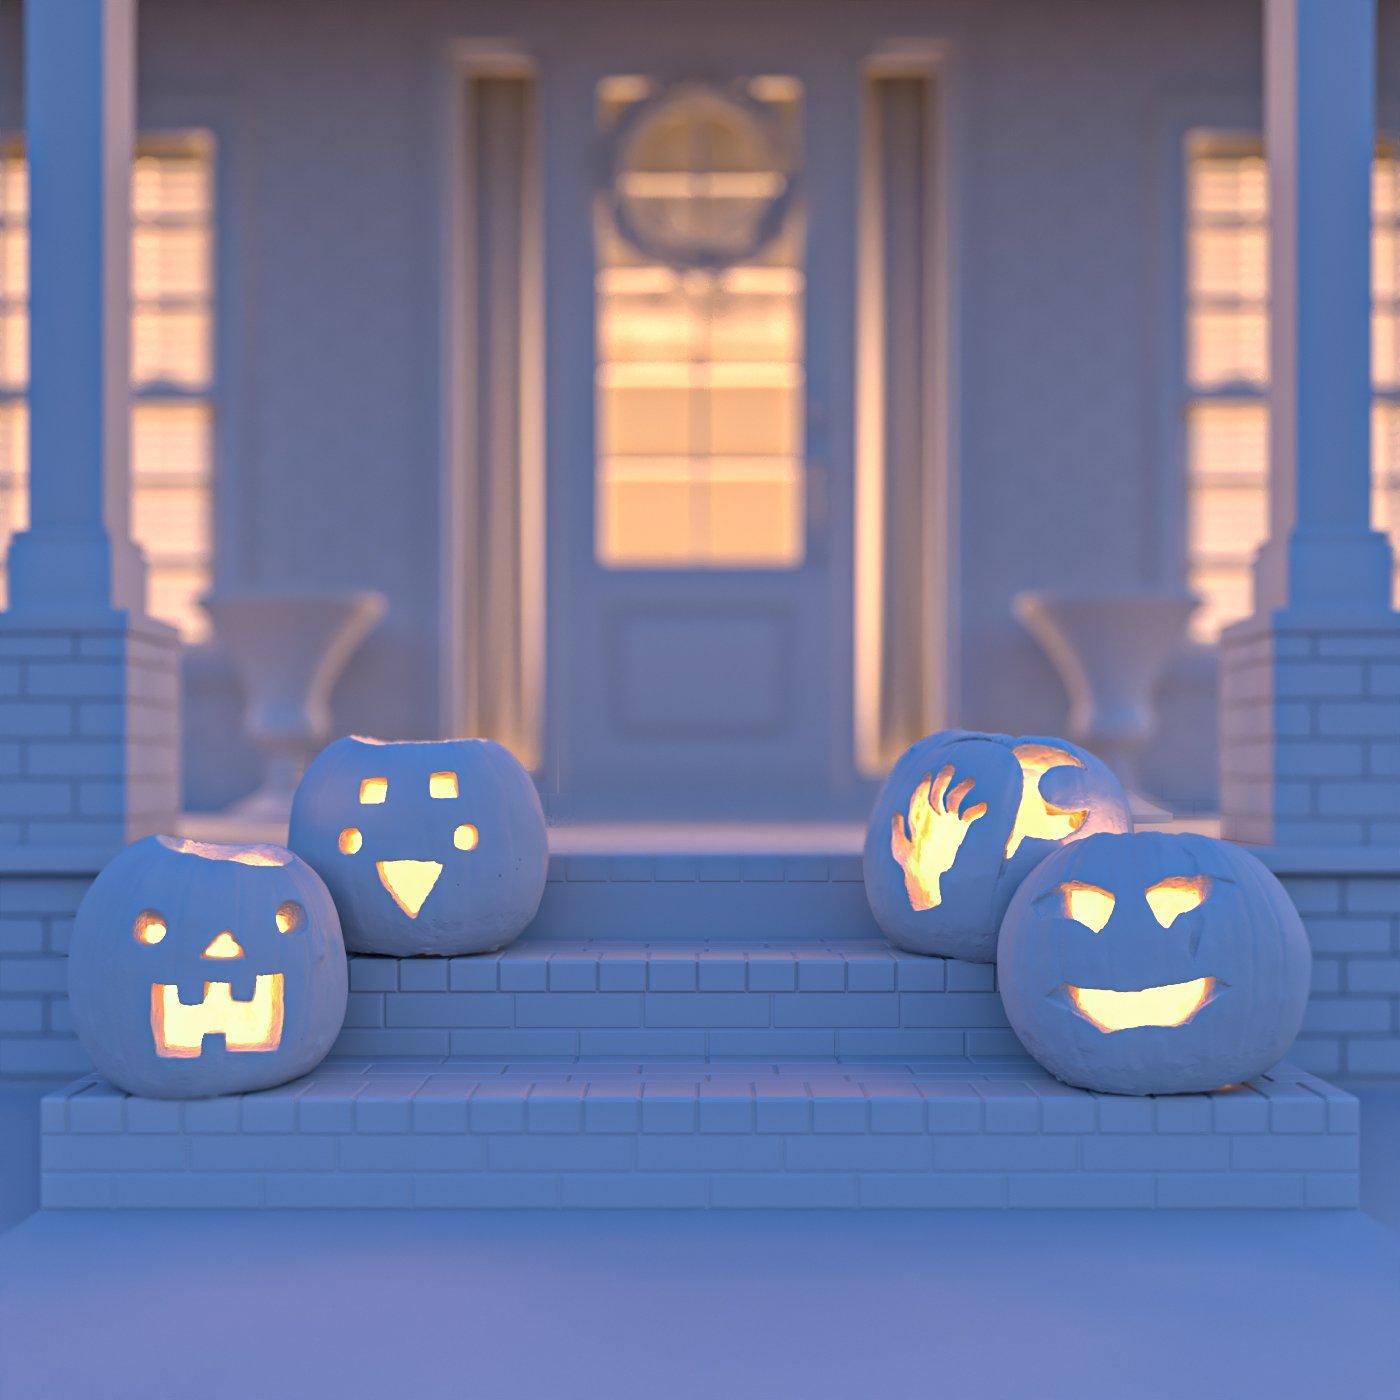 Lighting the pumpkins in 3DS Max